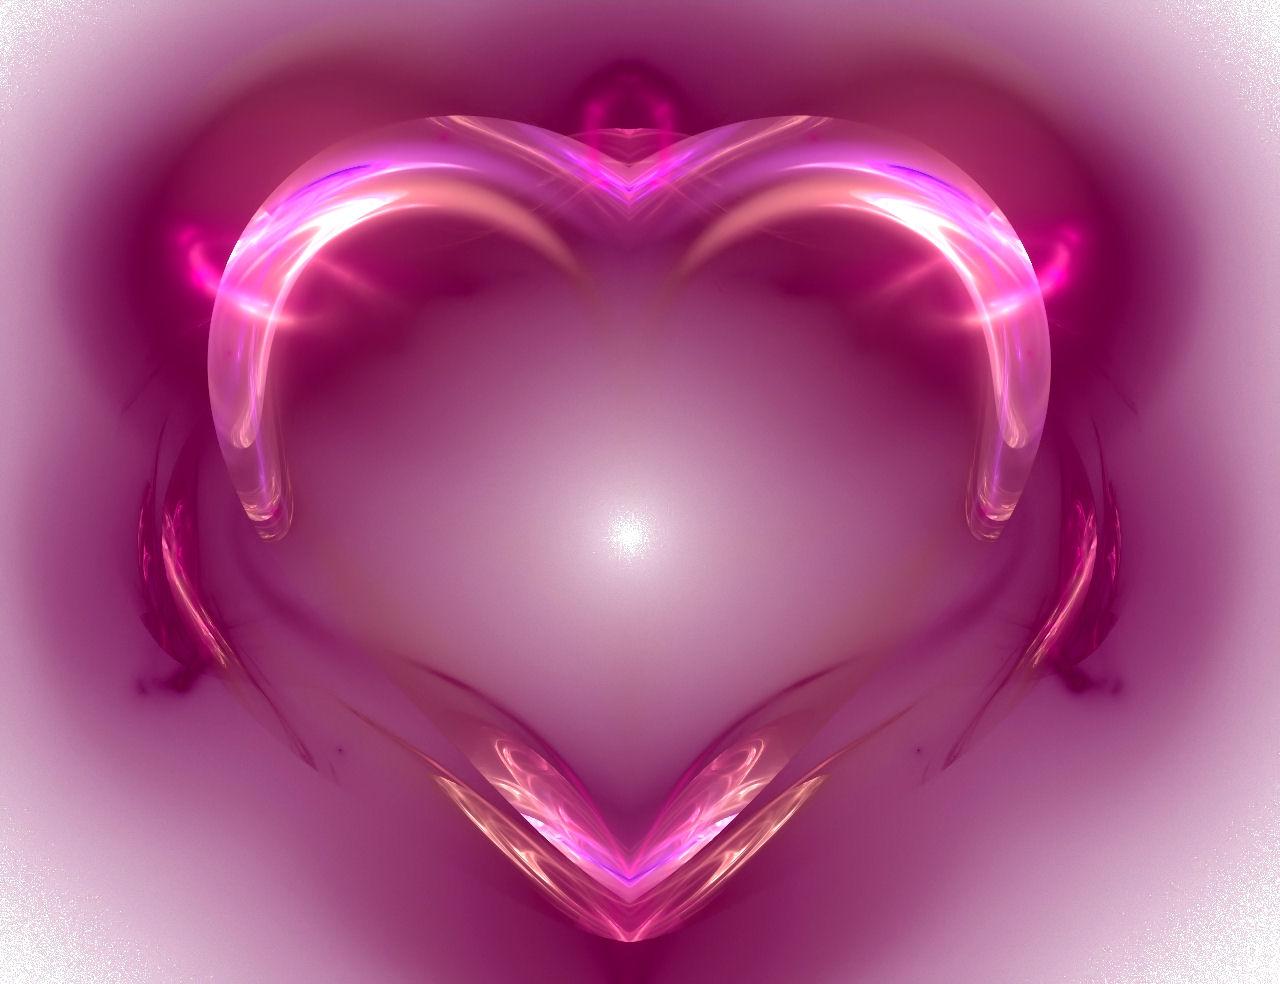 Pink Abstract Heart Wallpaper | Pink Wallpaper Backgrounds